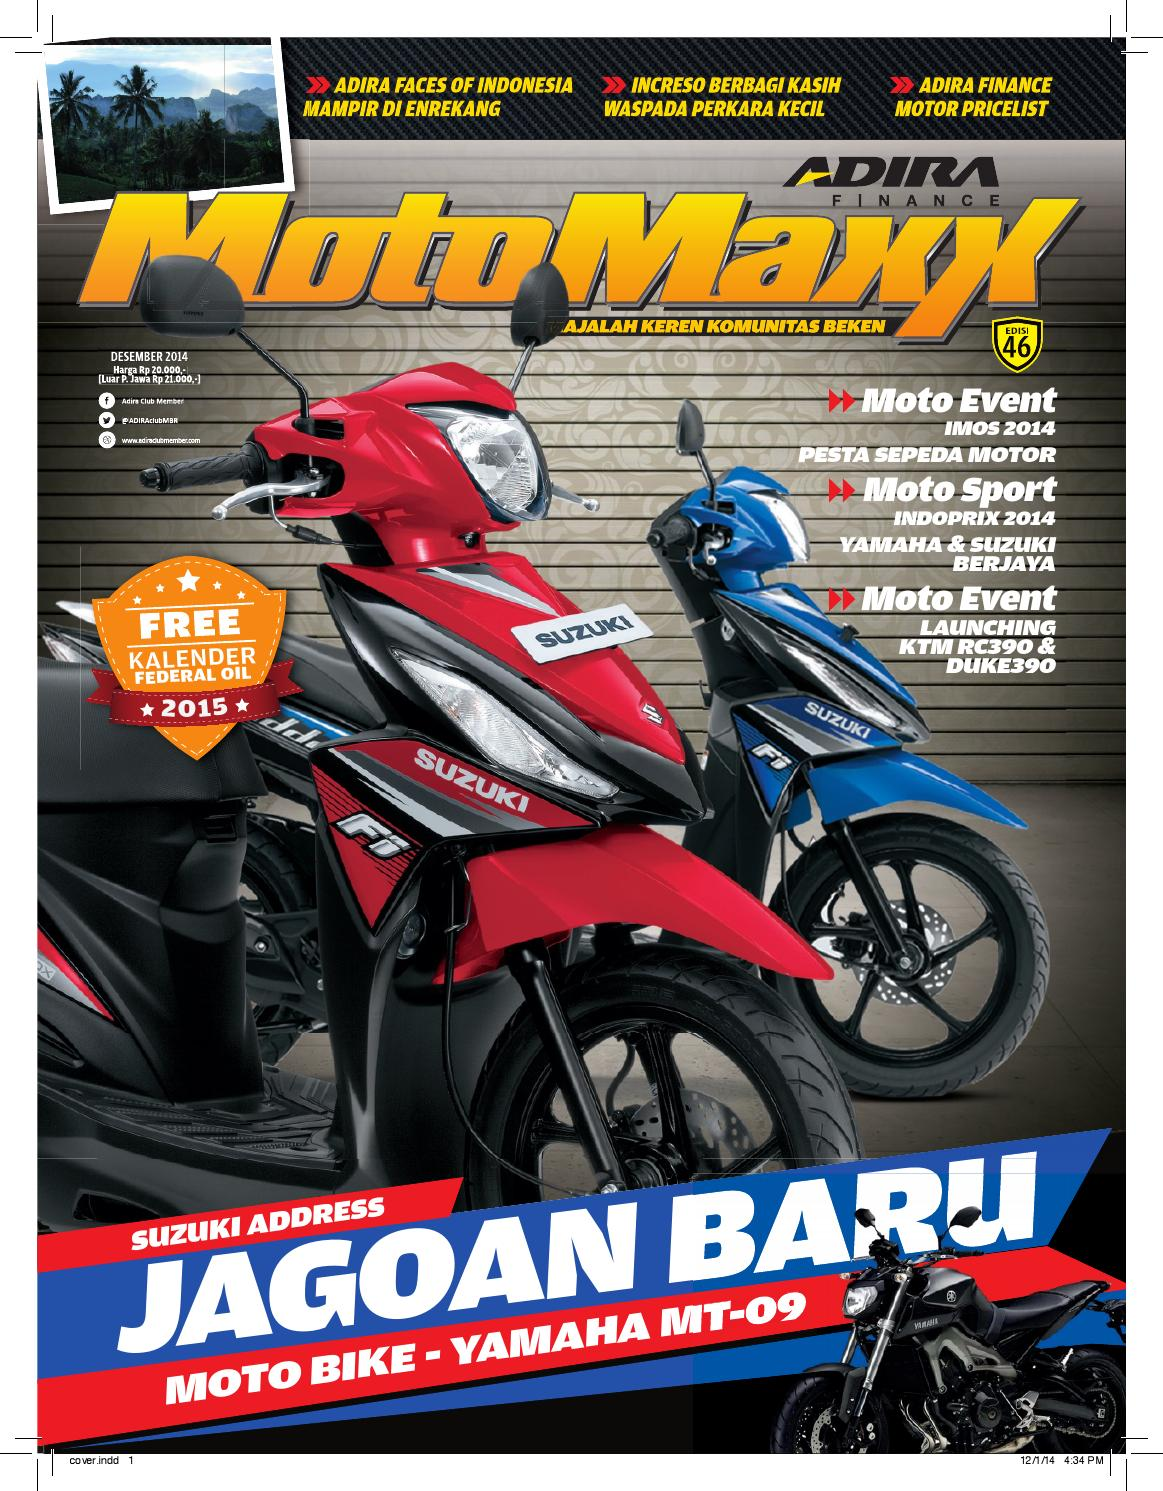 Motomaxx 12 2014 By Adira Member Issuu All New Cbr 150r Victory Black Red Banyumas